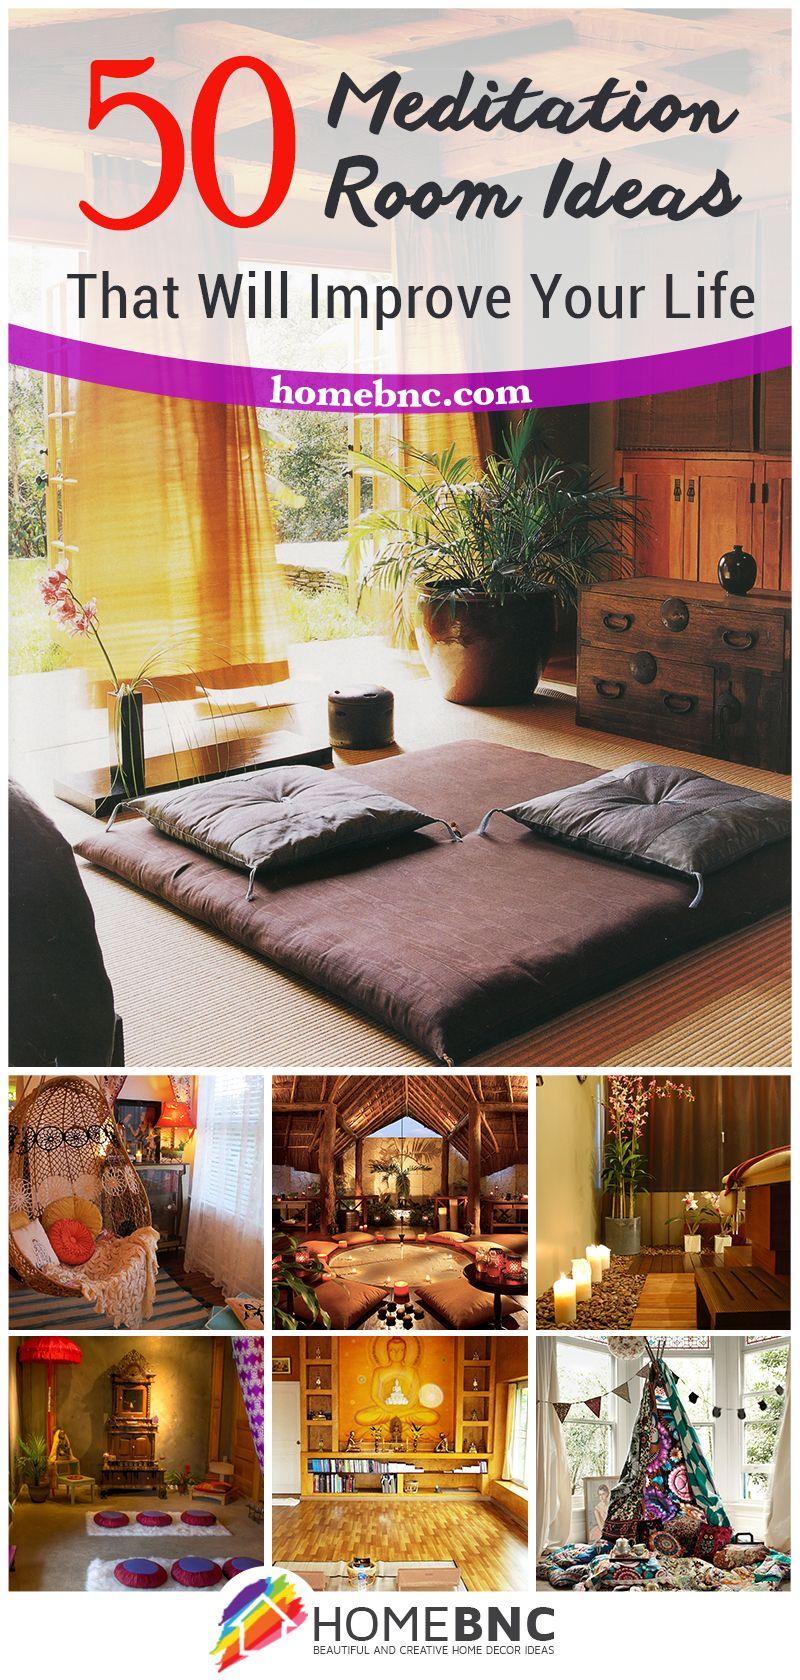 50 Meditation Room Ideas that Will Improve Your Life | 50er, Leben ...